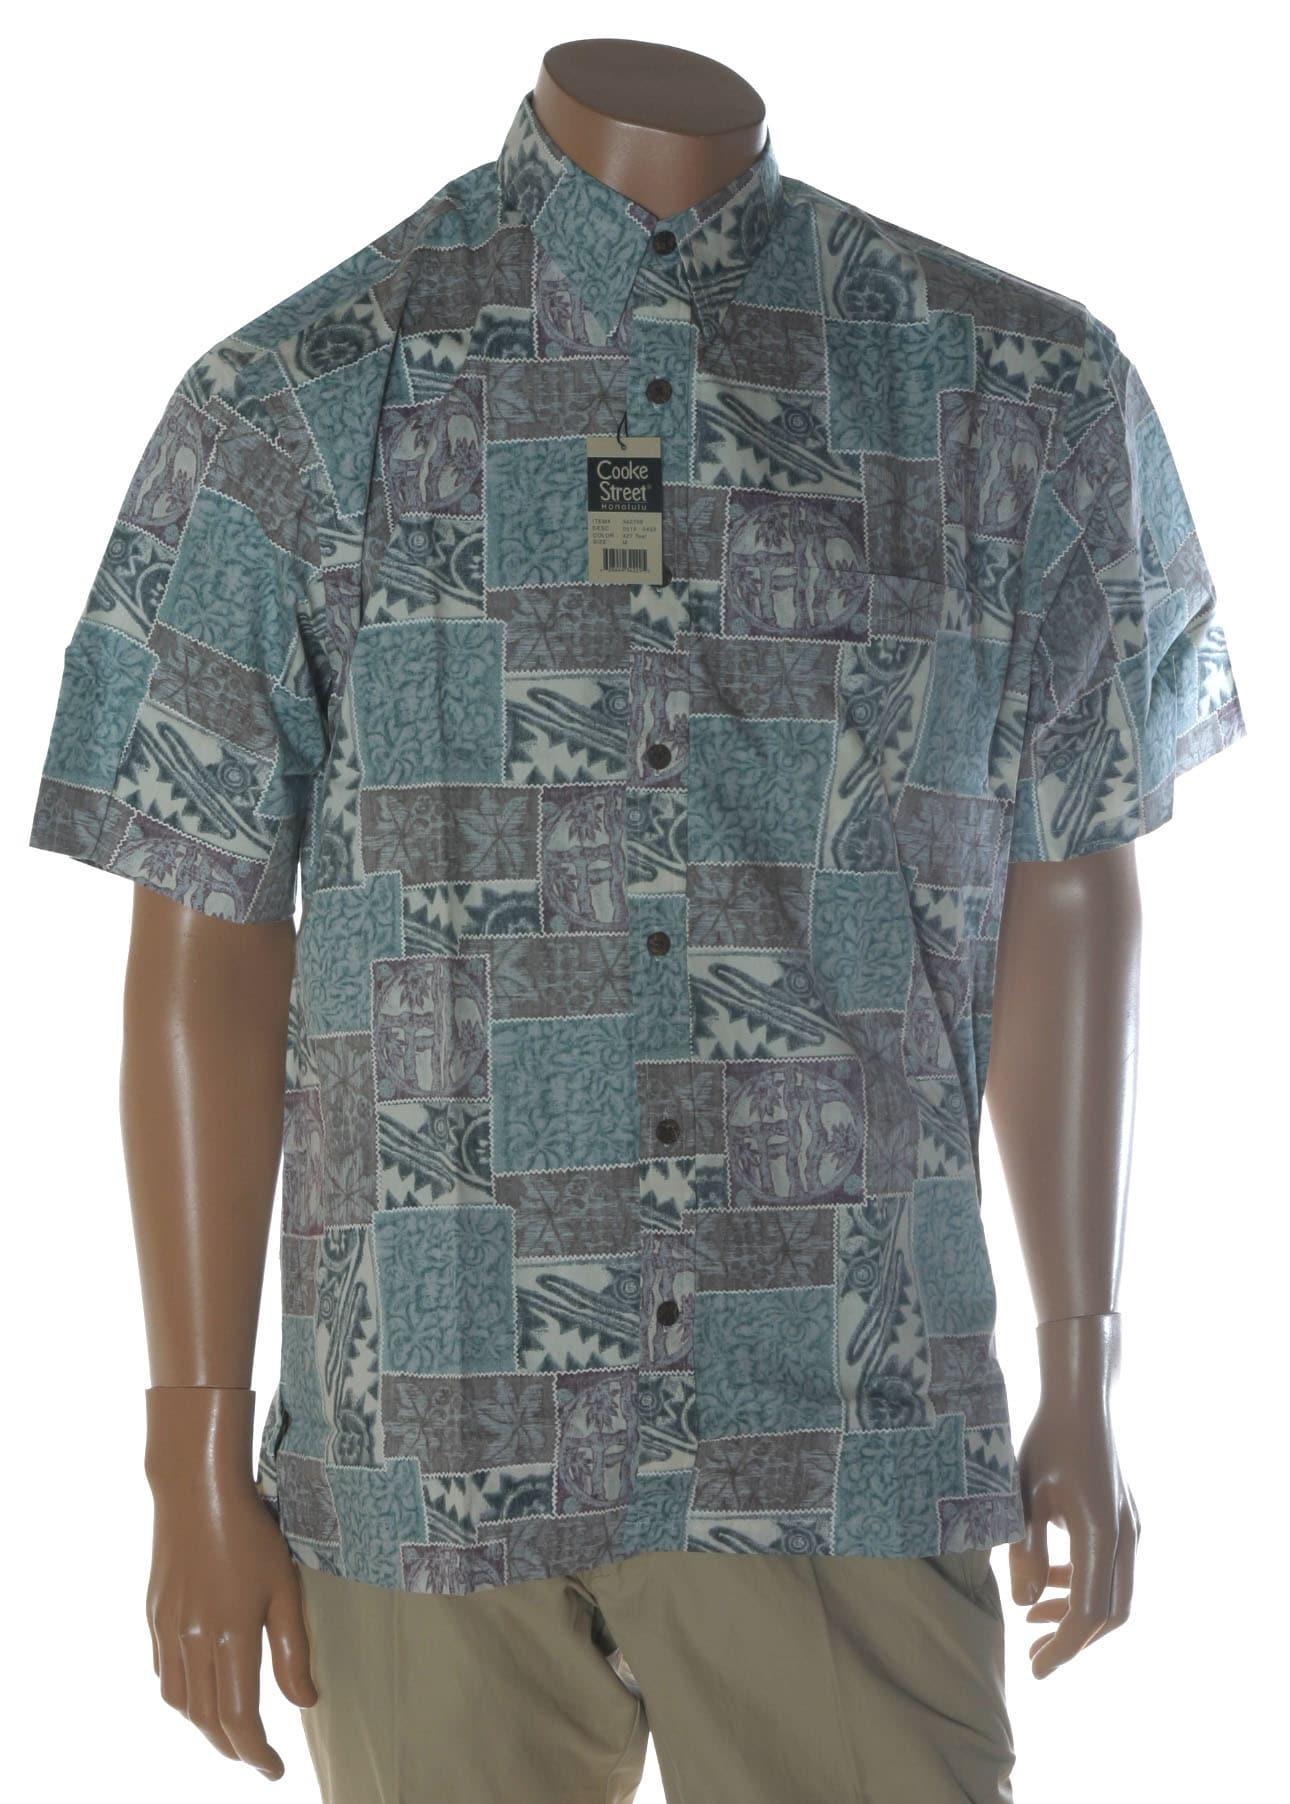 Cooke Street Honolulu Mens Hawaiian Shirt